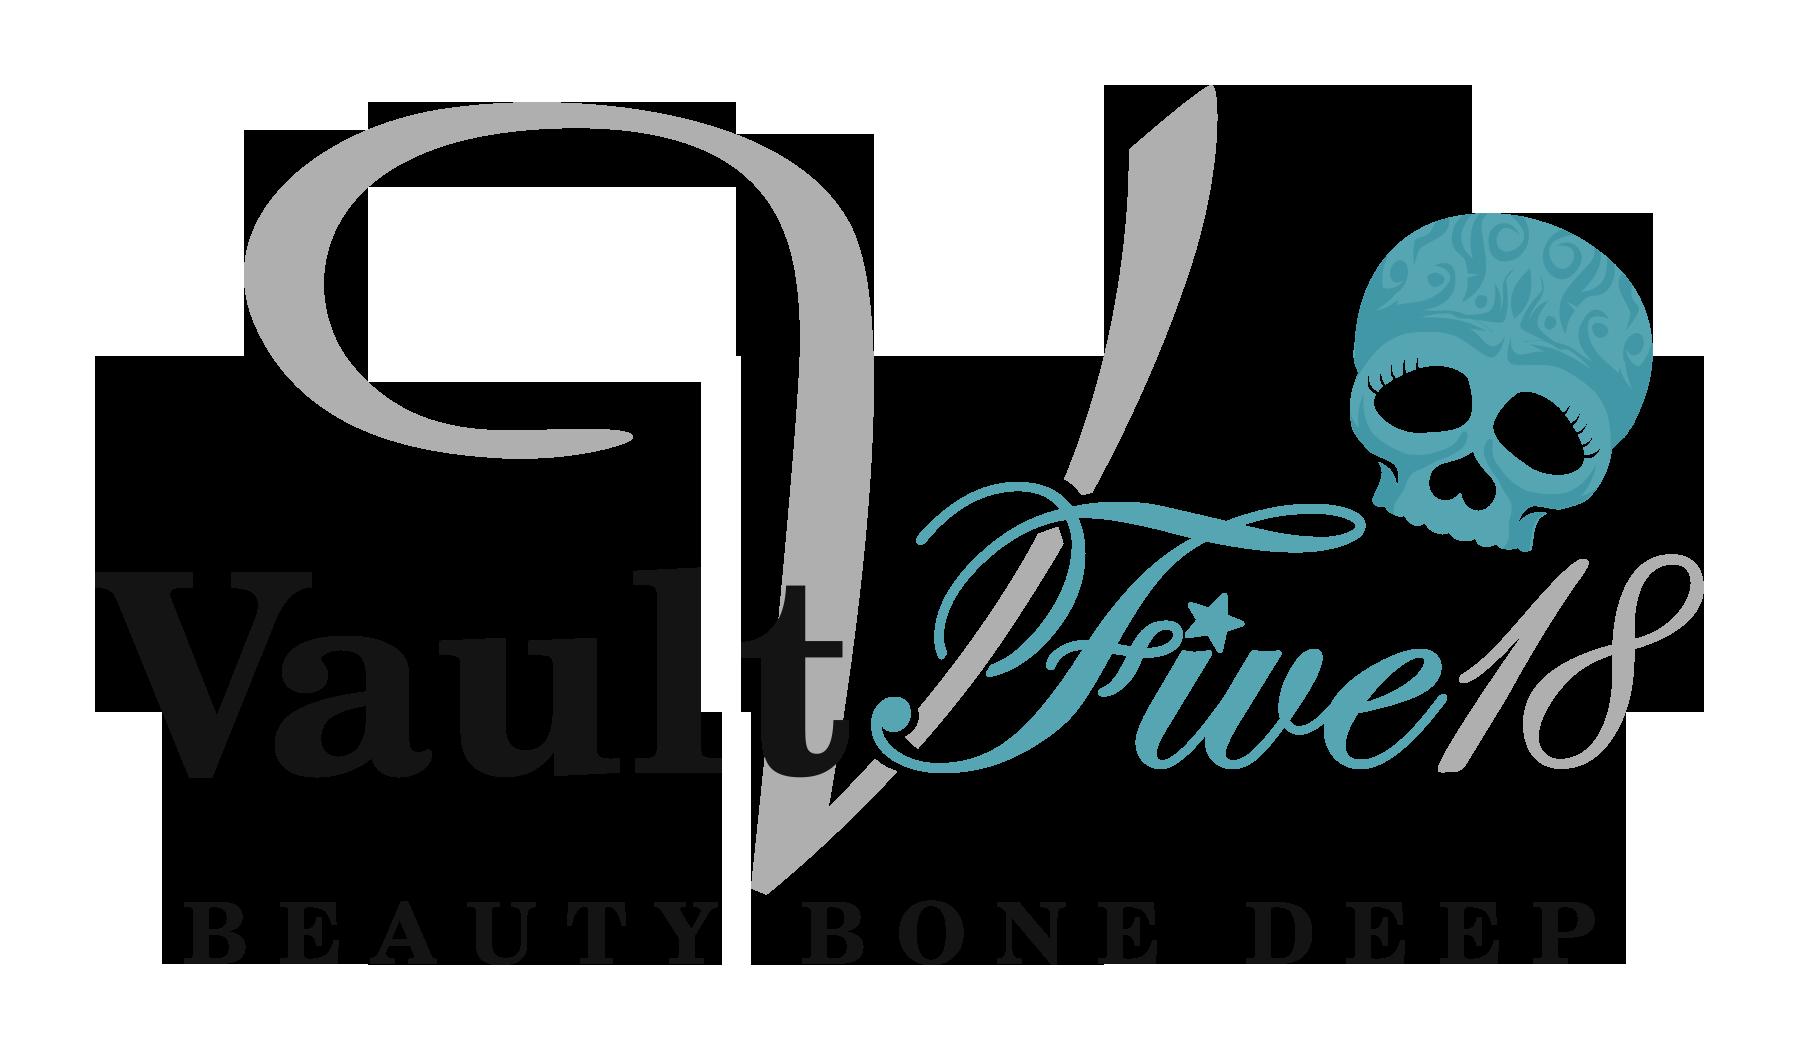 Beauty Bone Deep. Give me a pretty skull (not too girlie!) for a salon logo